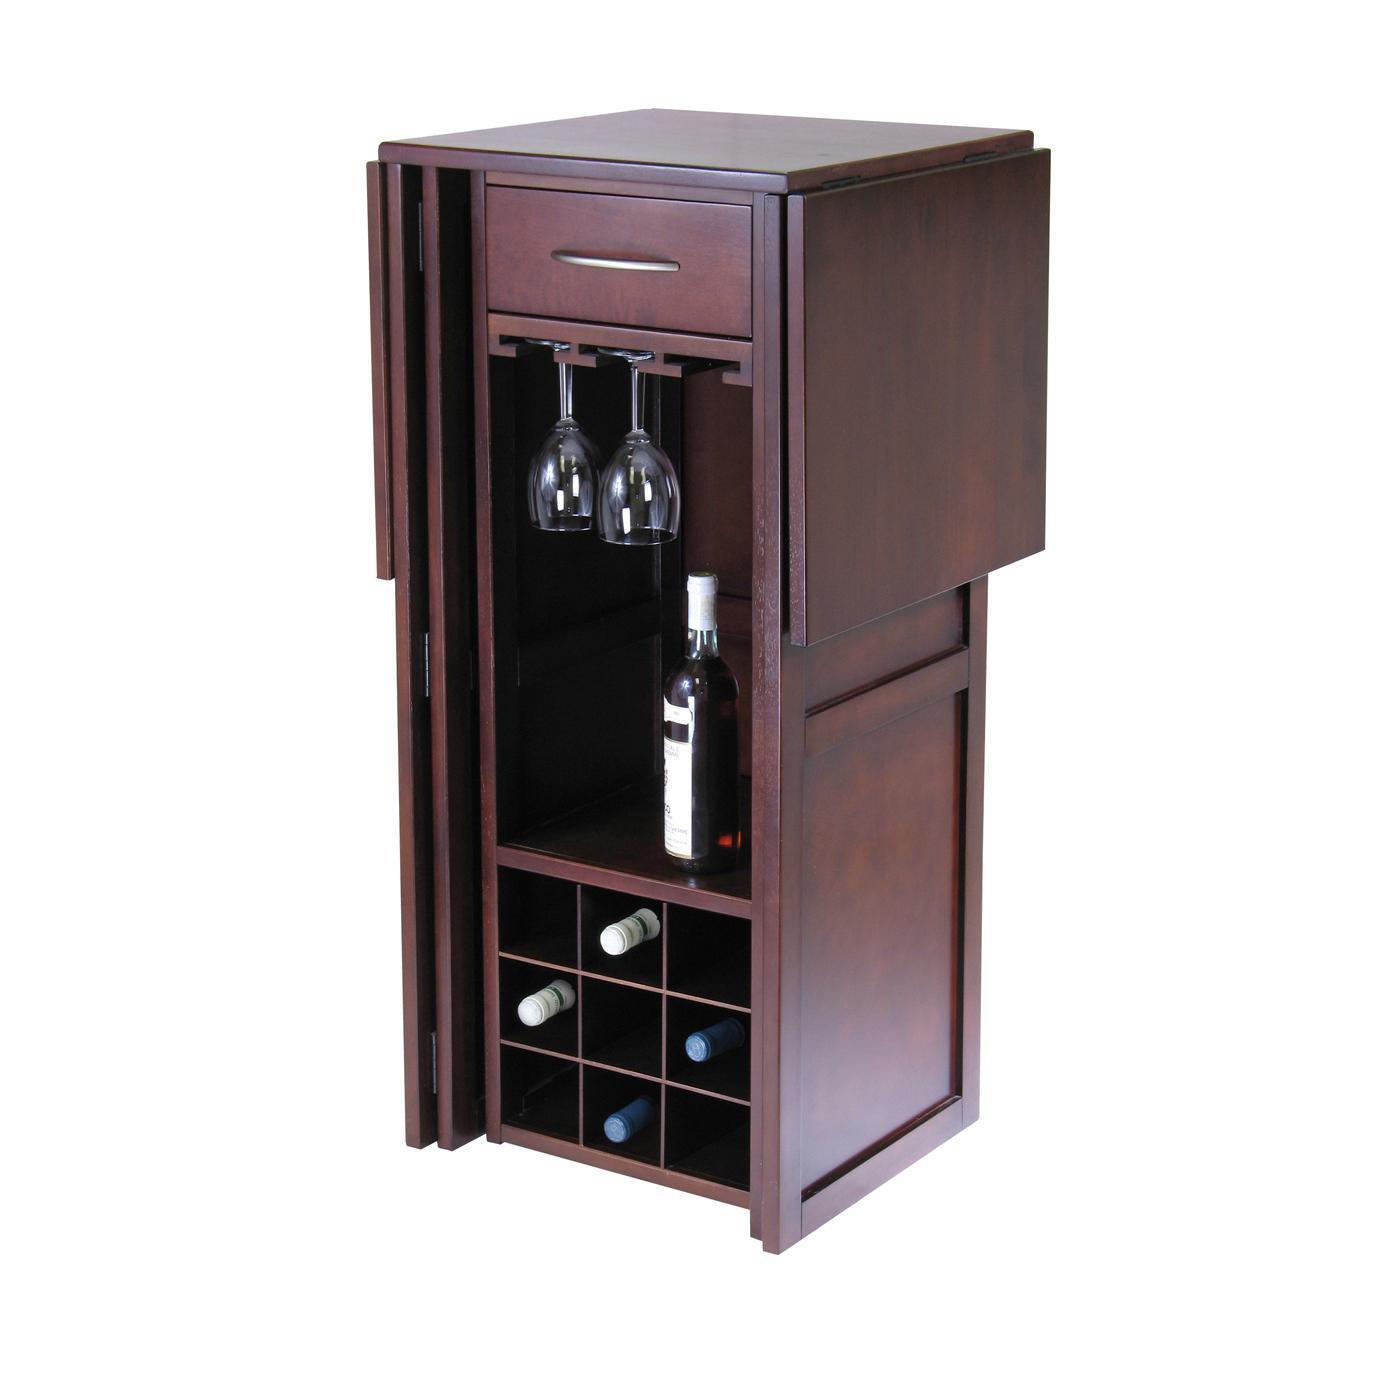 Kitchen Bar Cabinets: Amazon.com: Winsome Newport Expandable Wine Bar: Kitchen